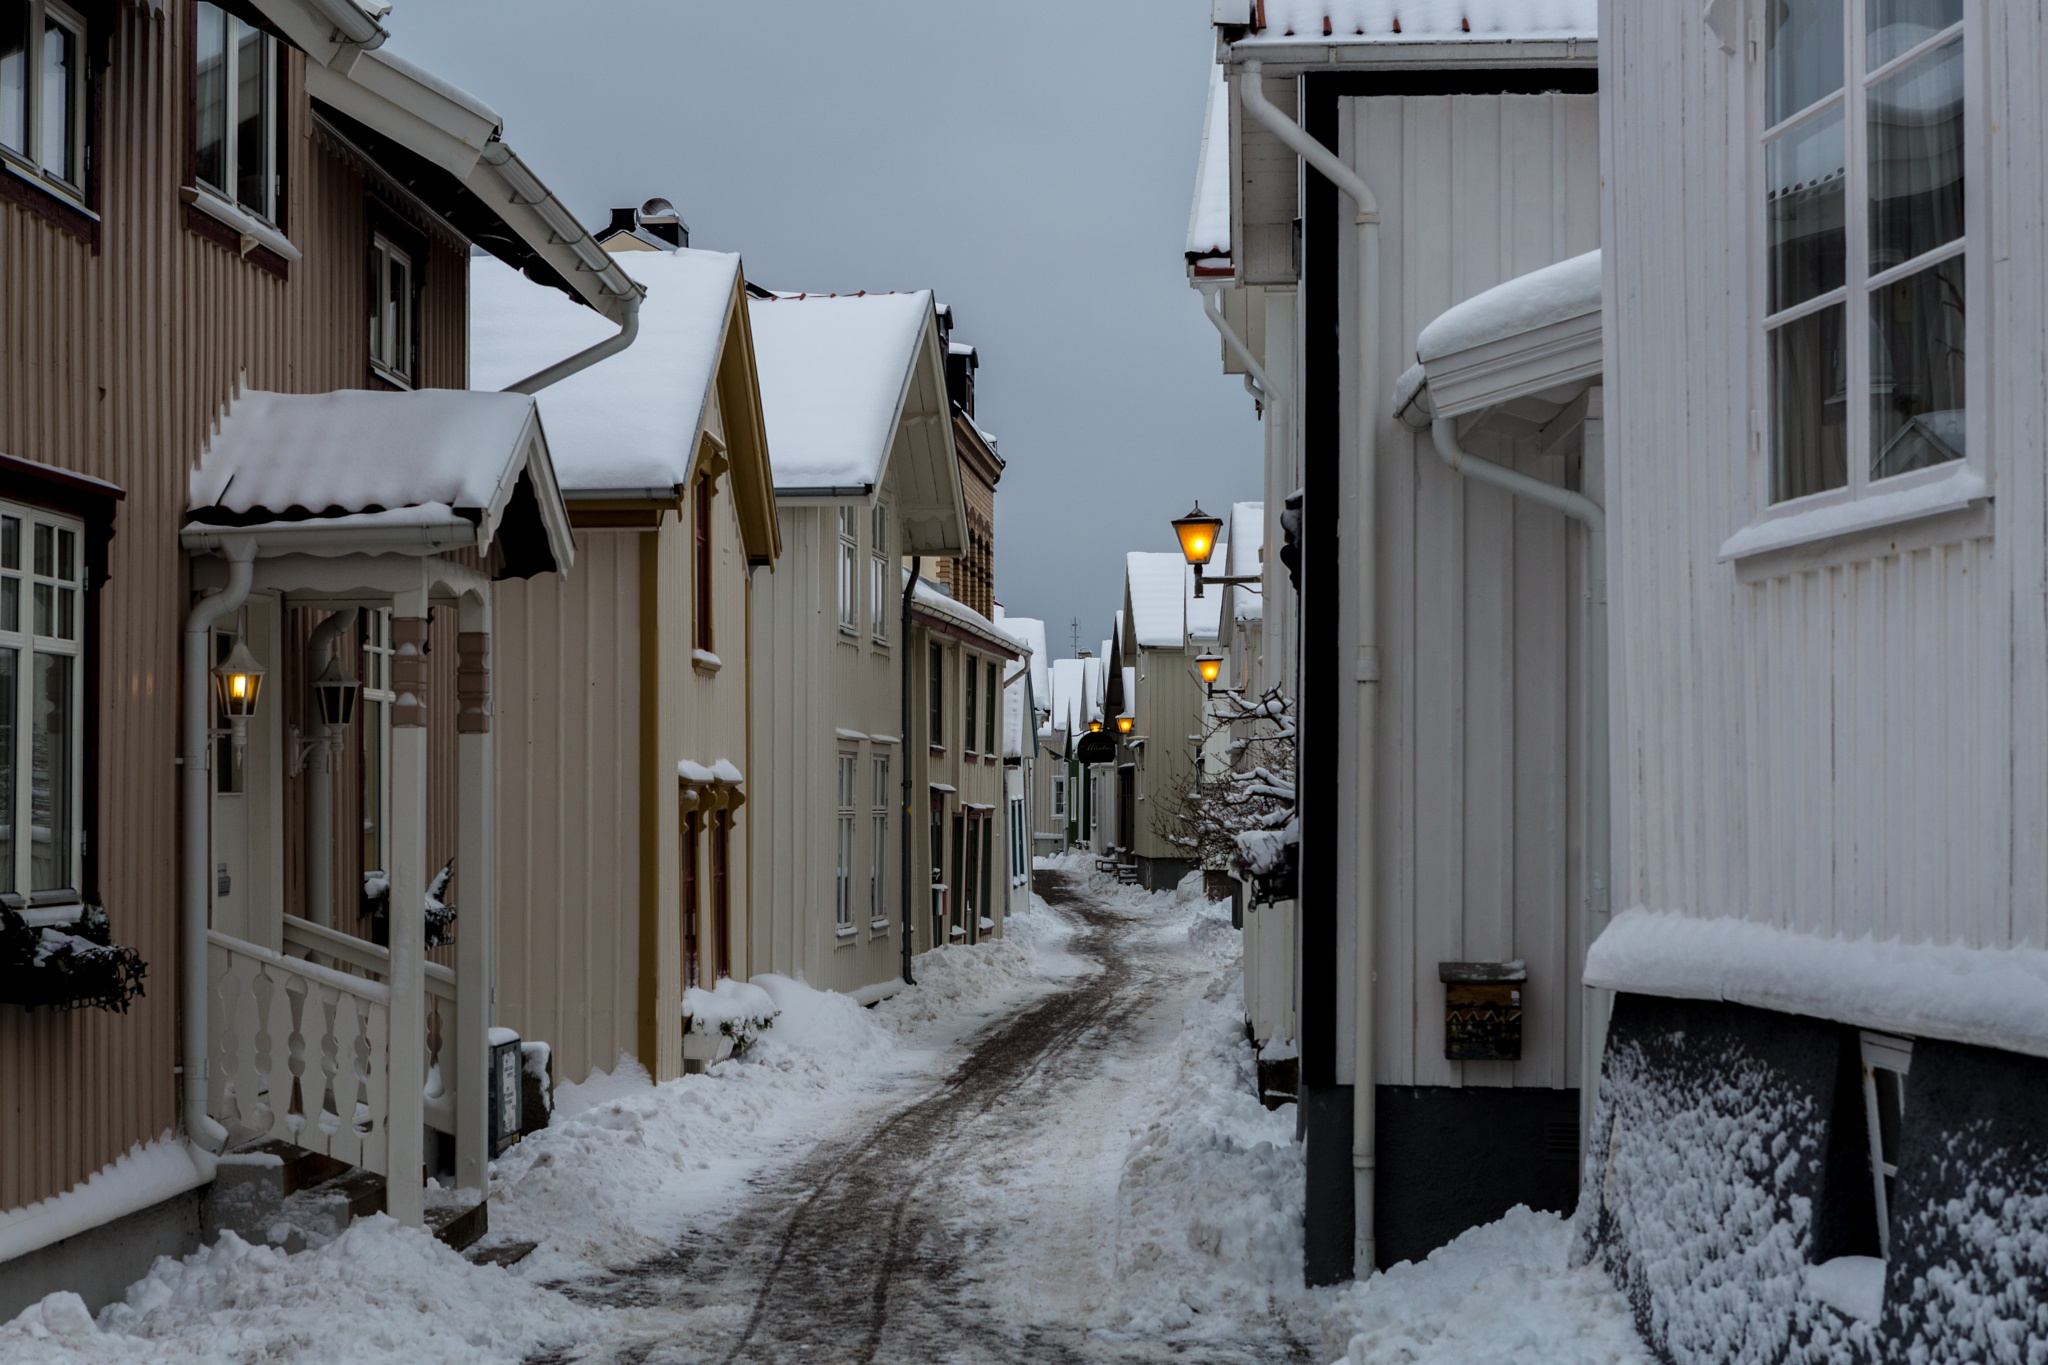 The old city by Pär Ohlson